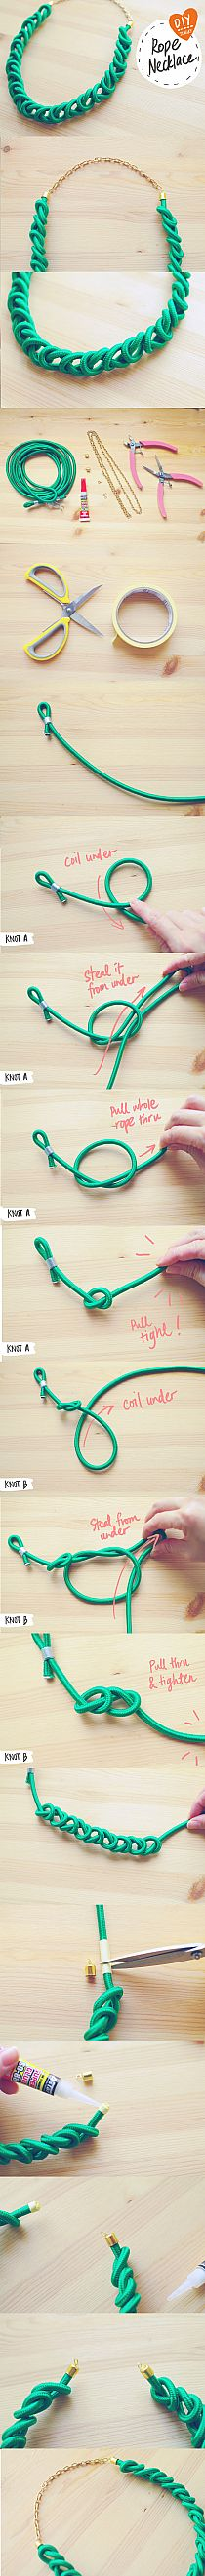 diy rope necklace jewelry necklaces, diy necklace, collar, diy bracelet, diy rope necklace, knot, rope bracelet diy